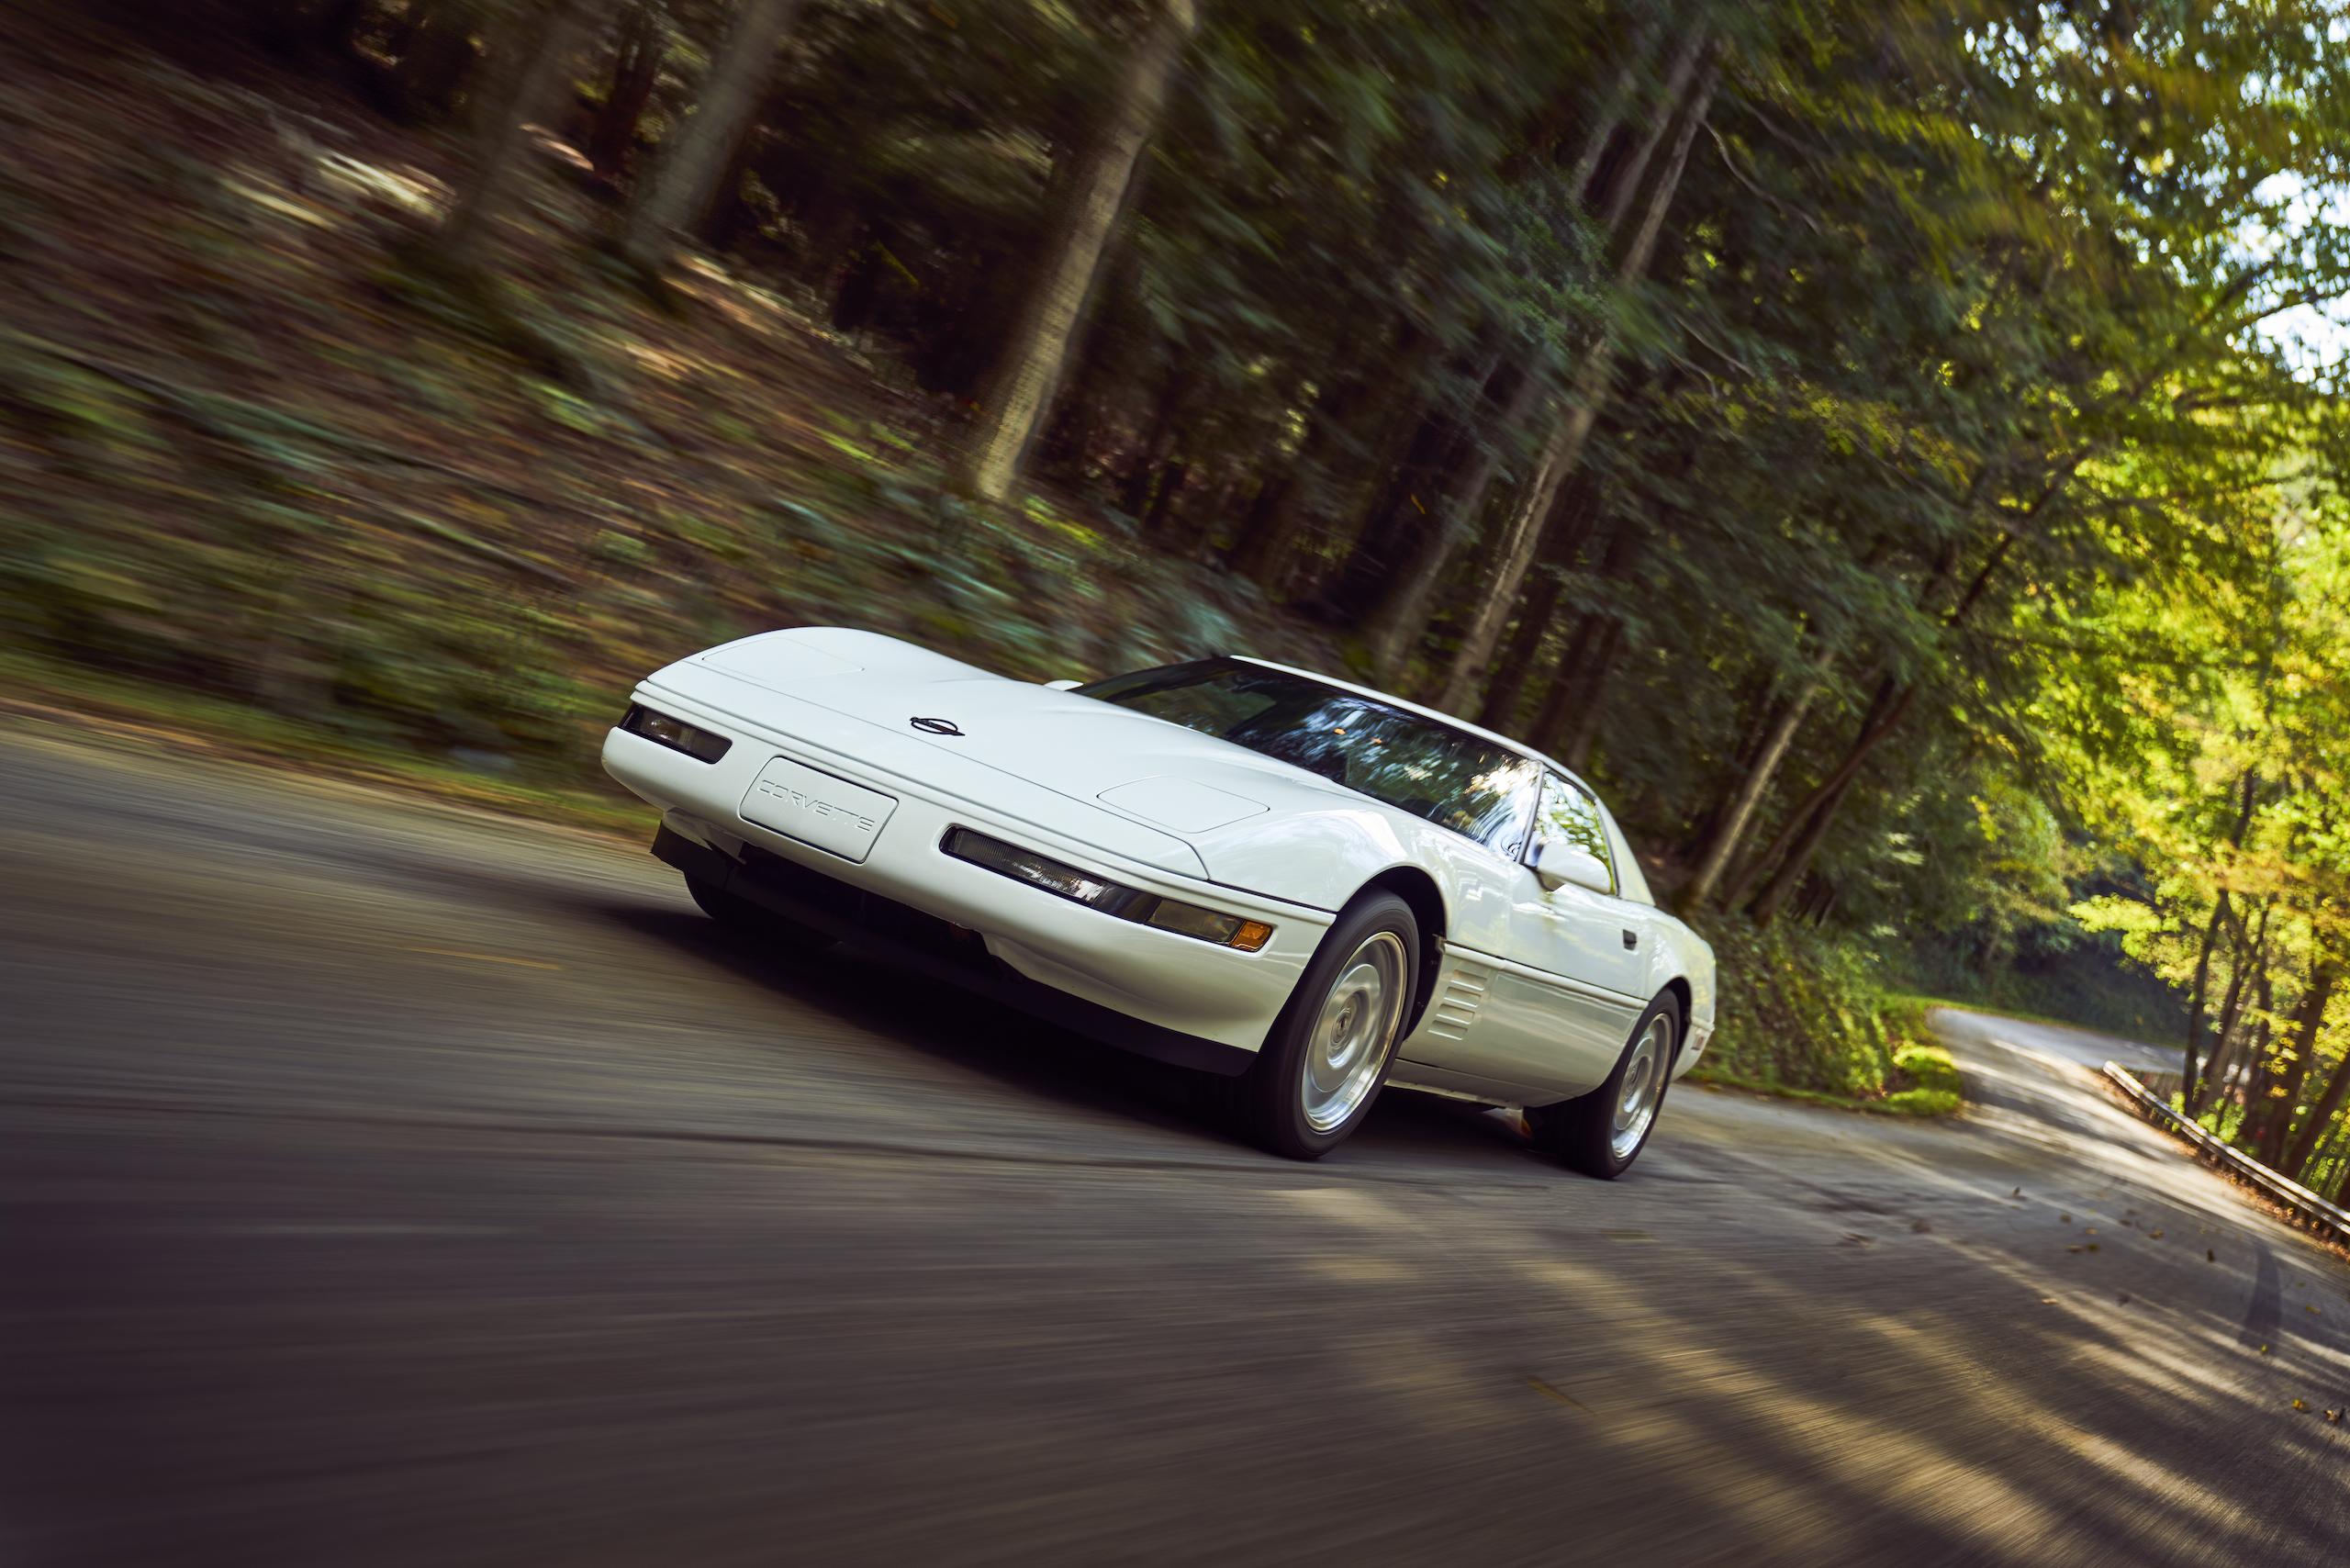 C4 Chevrolet Corvette front three-quarter dynamic road action